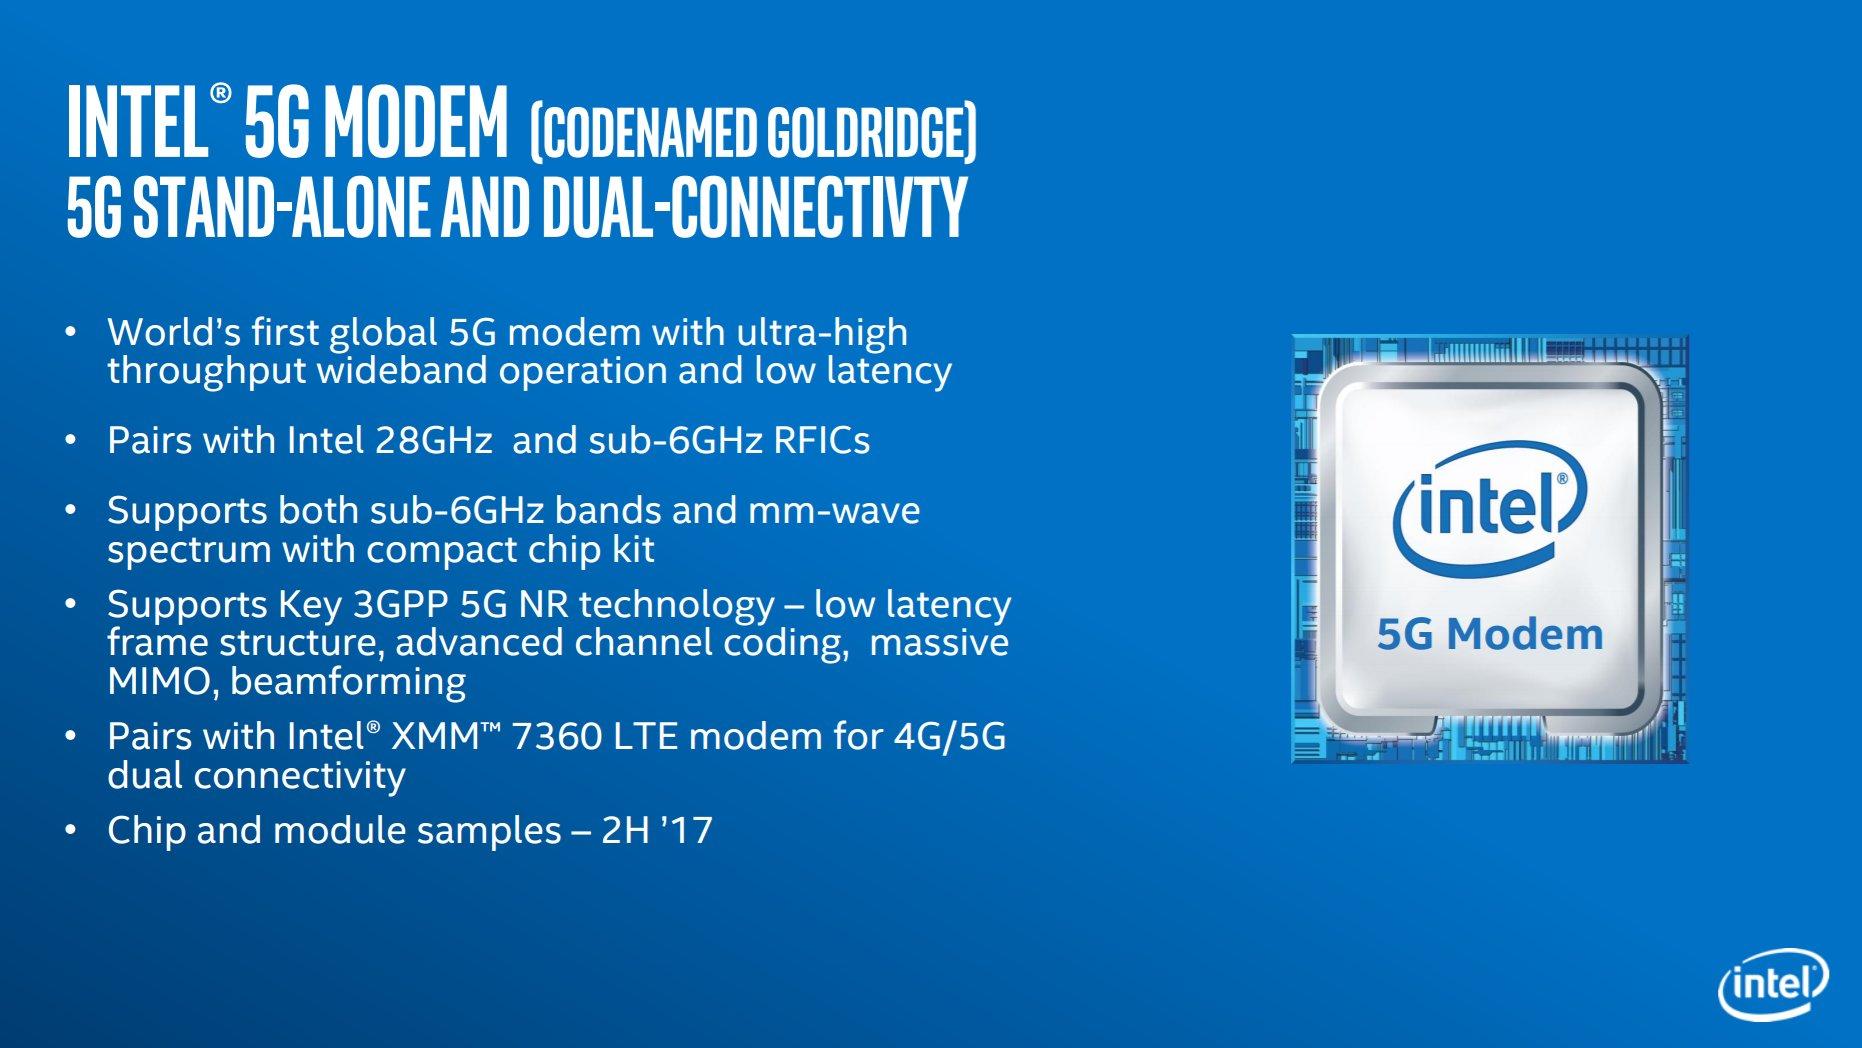 Intels 5G-Modem Gold Ridge